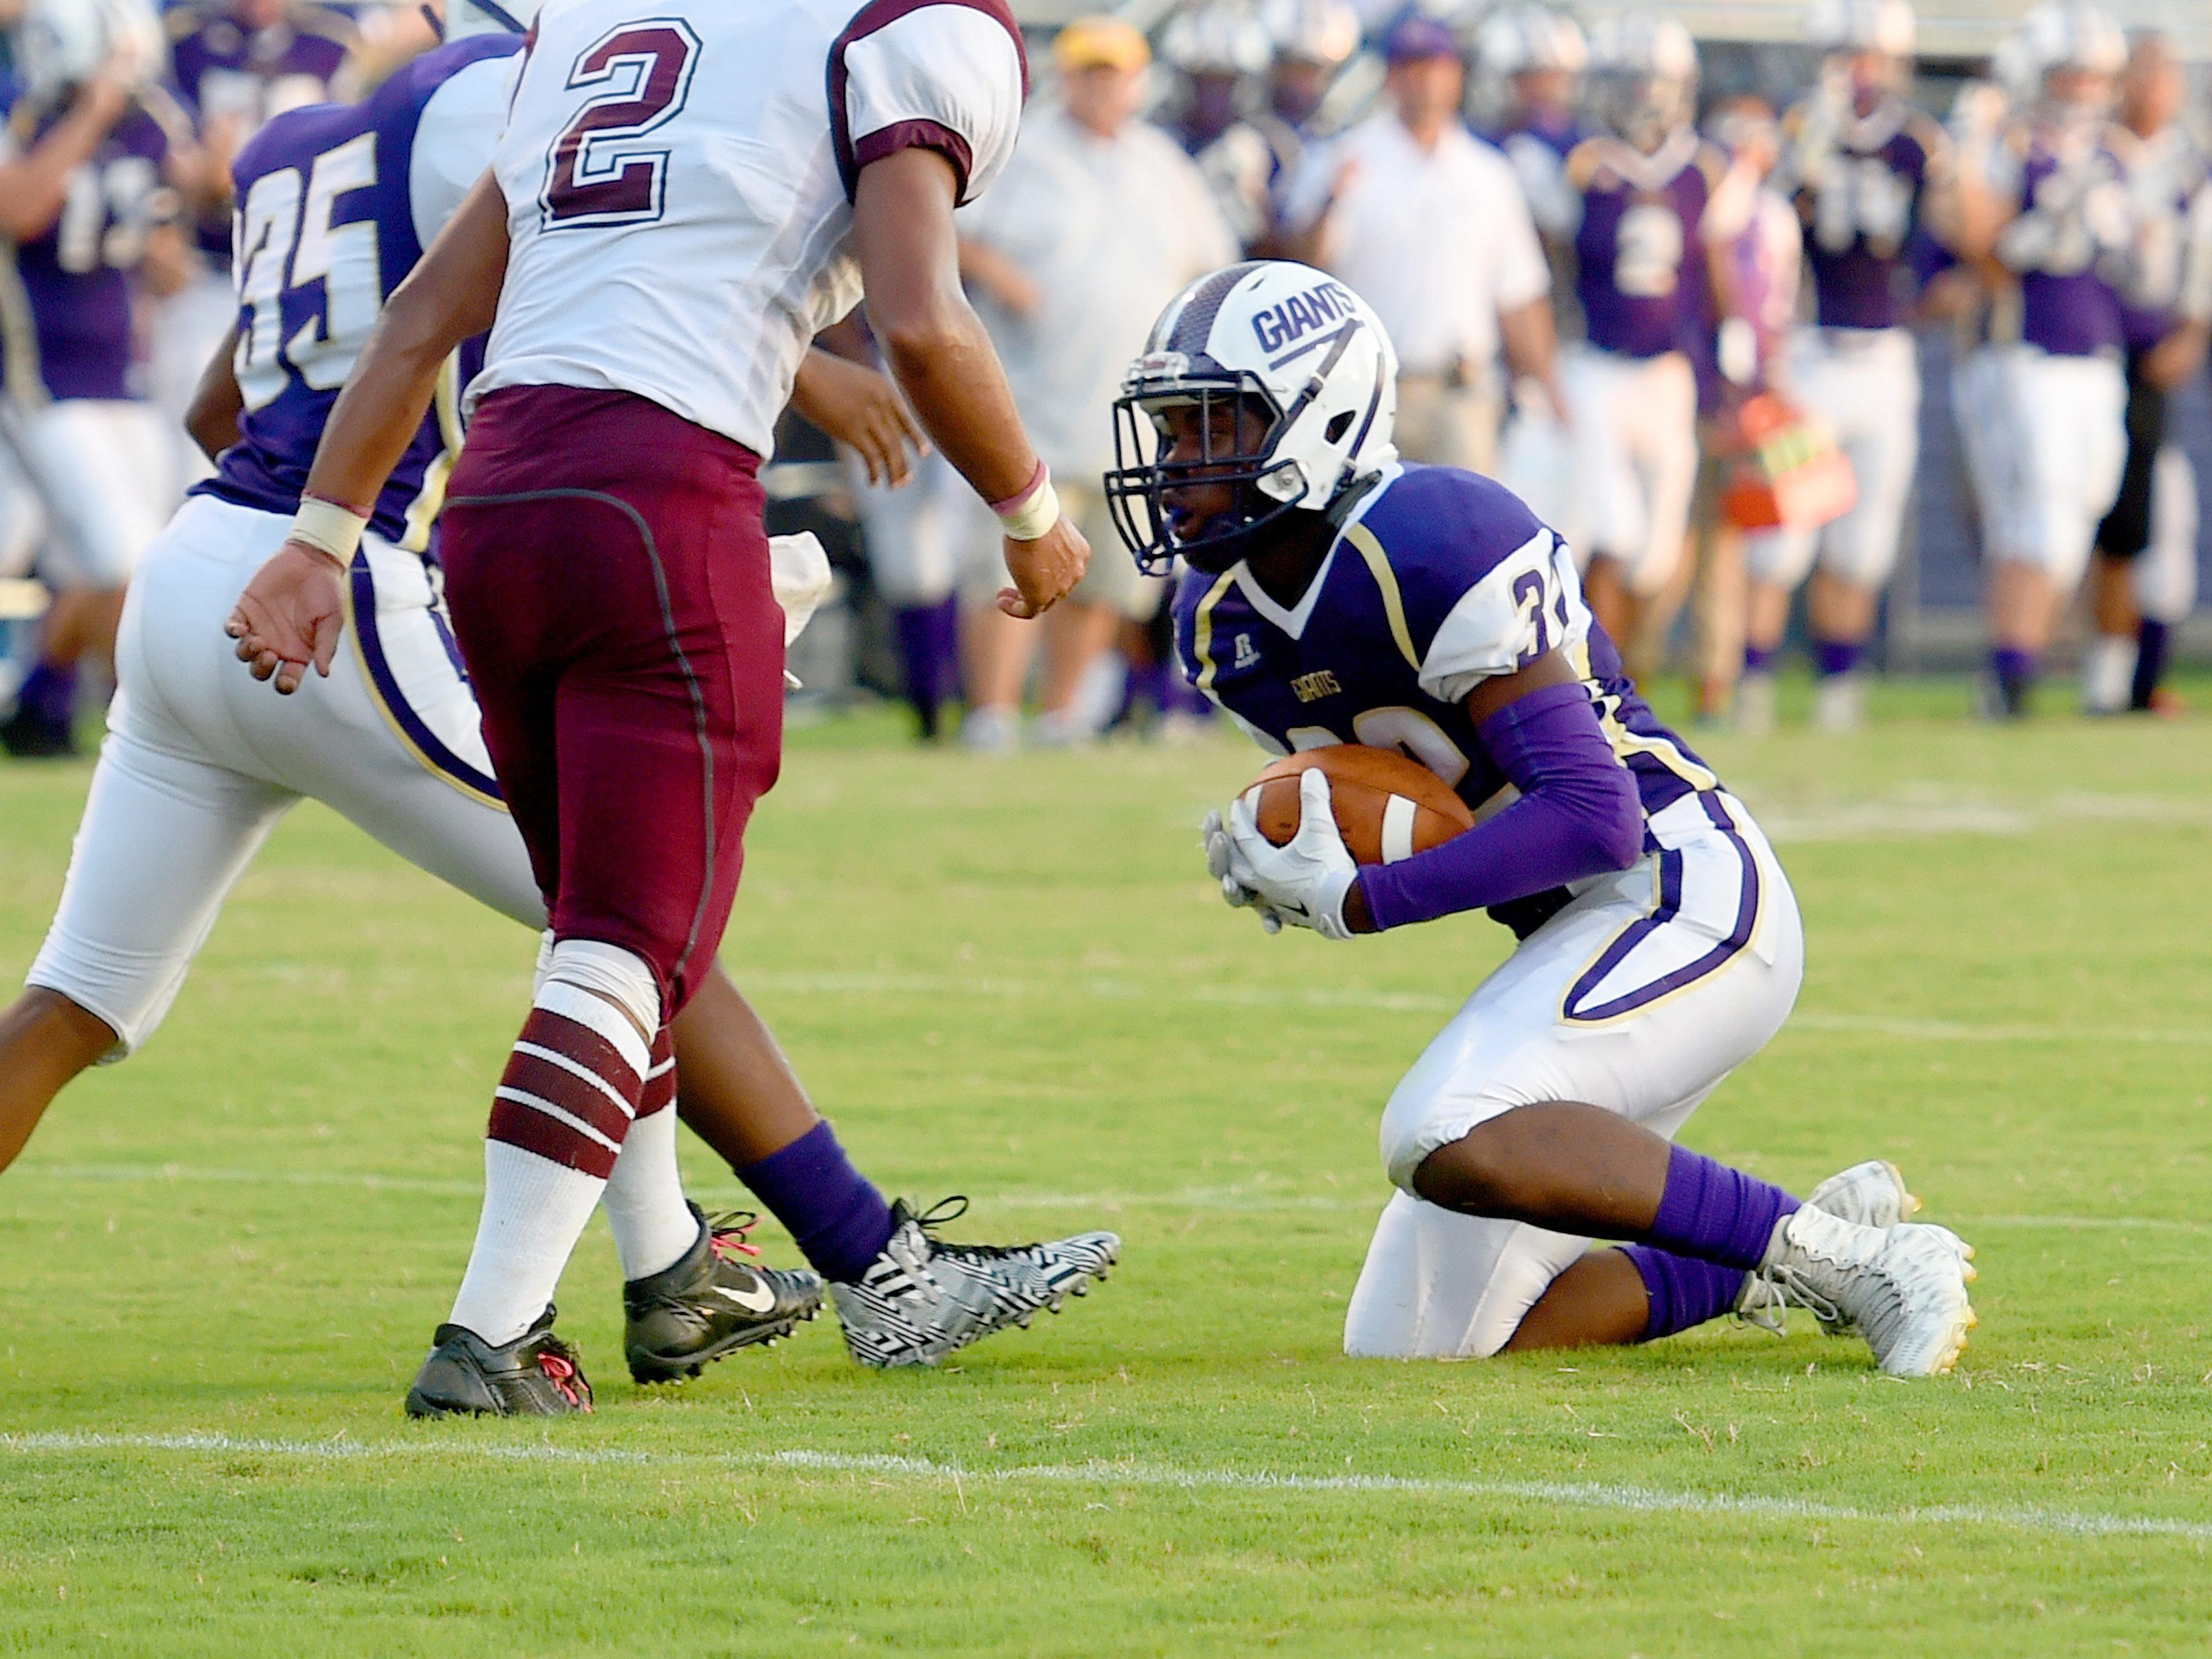 Waynesboro's Savion Jackson comes away with an interception during a football game played in Waynesboro on Friday, Sept. 11, 2015.